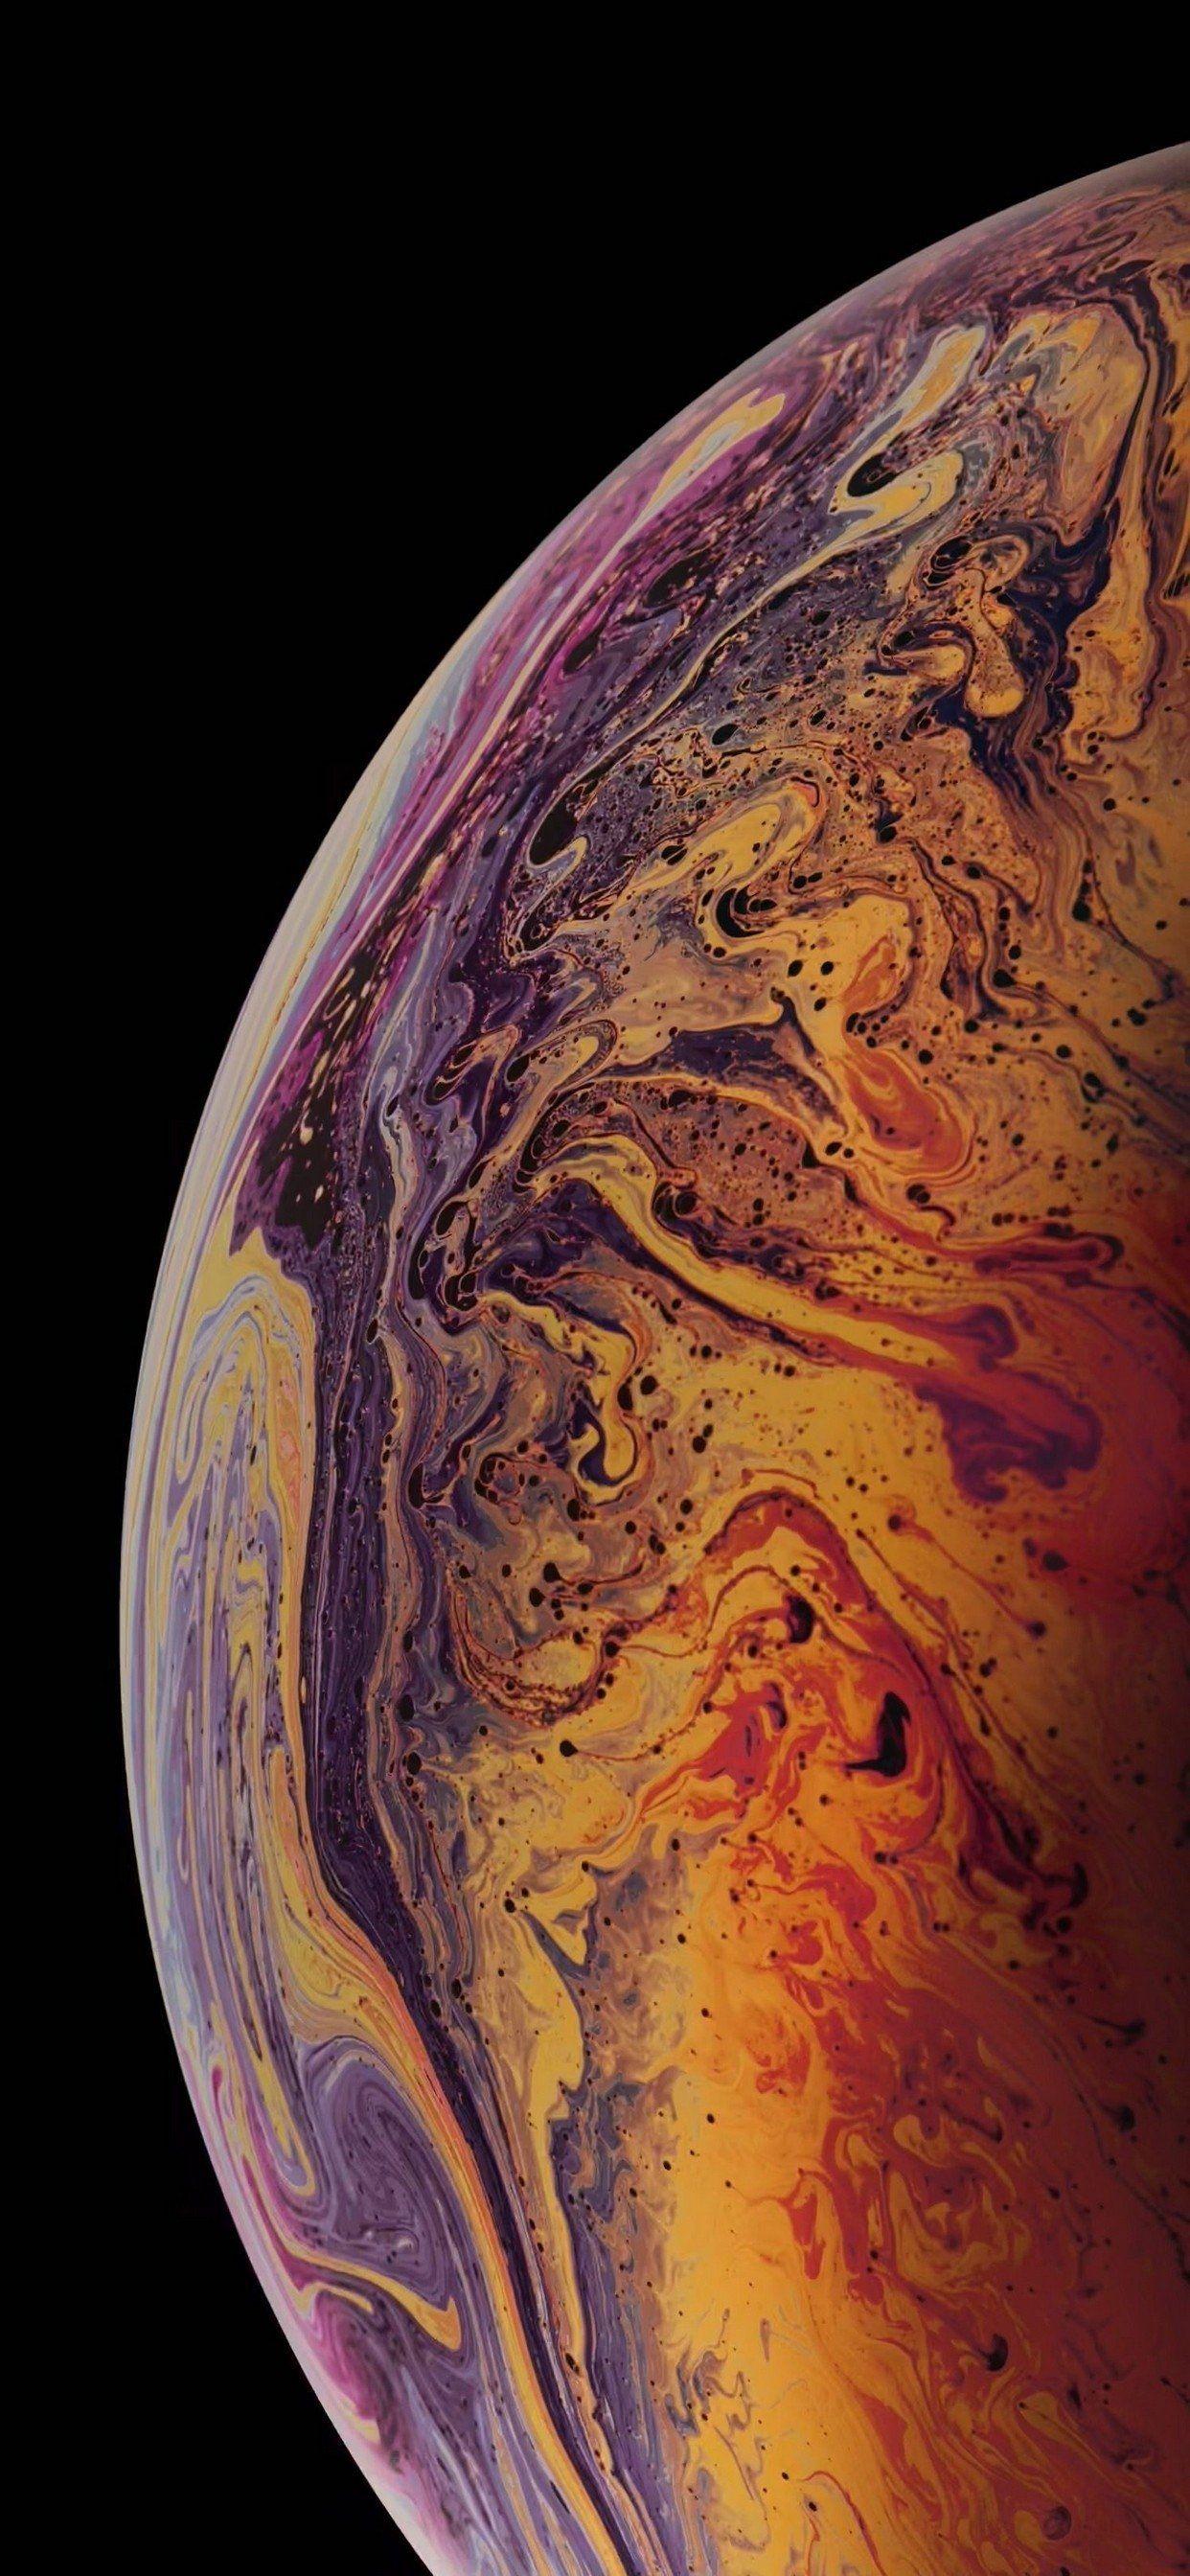 iPhone 4k Xs Wallpapers - Wallpaper Cave